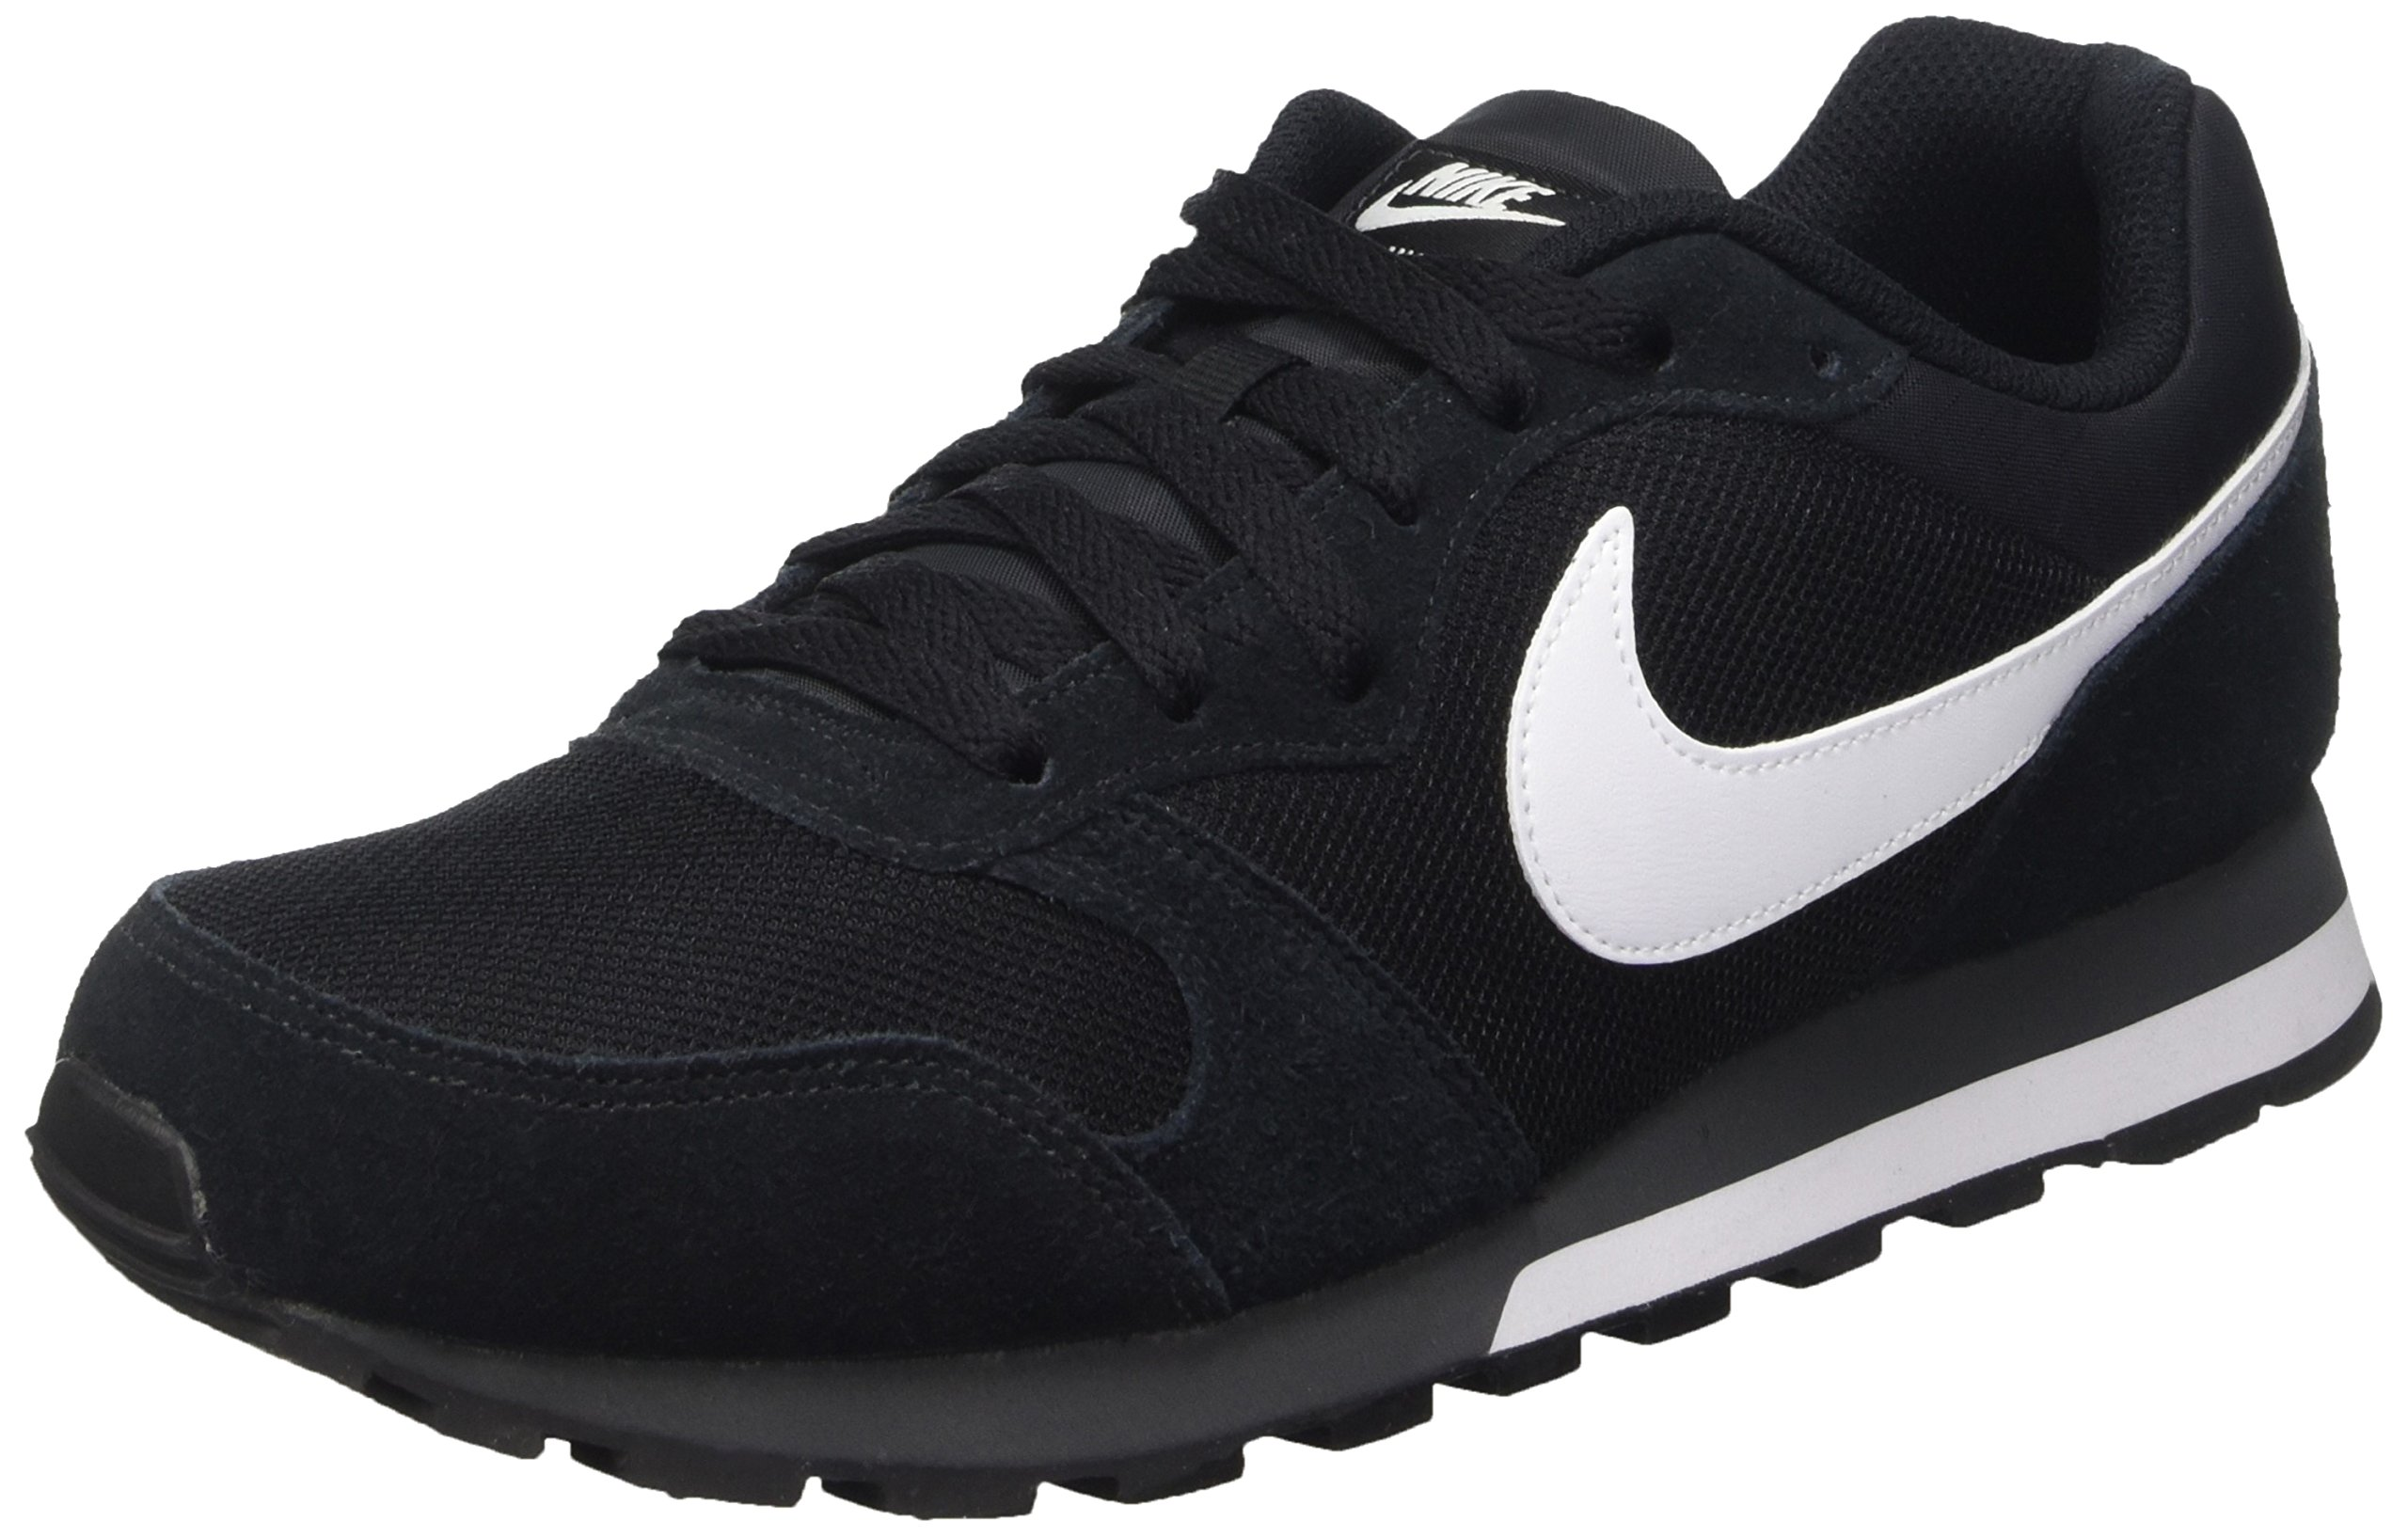 Nike 男式运动鞋 MD Runner 2